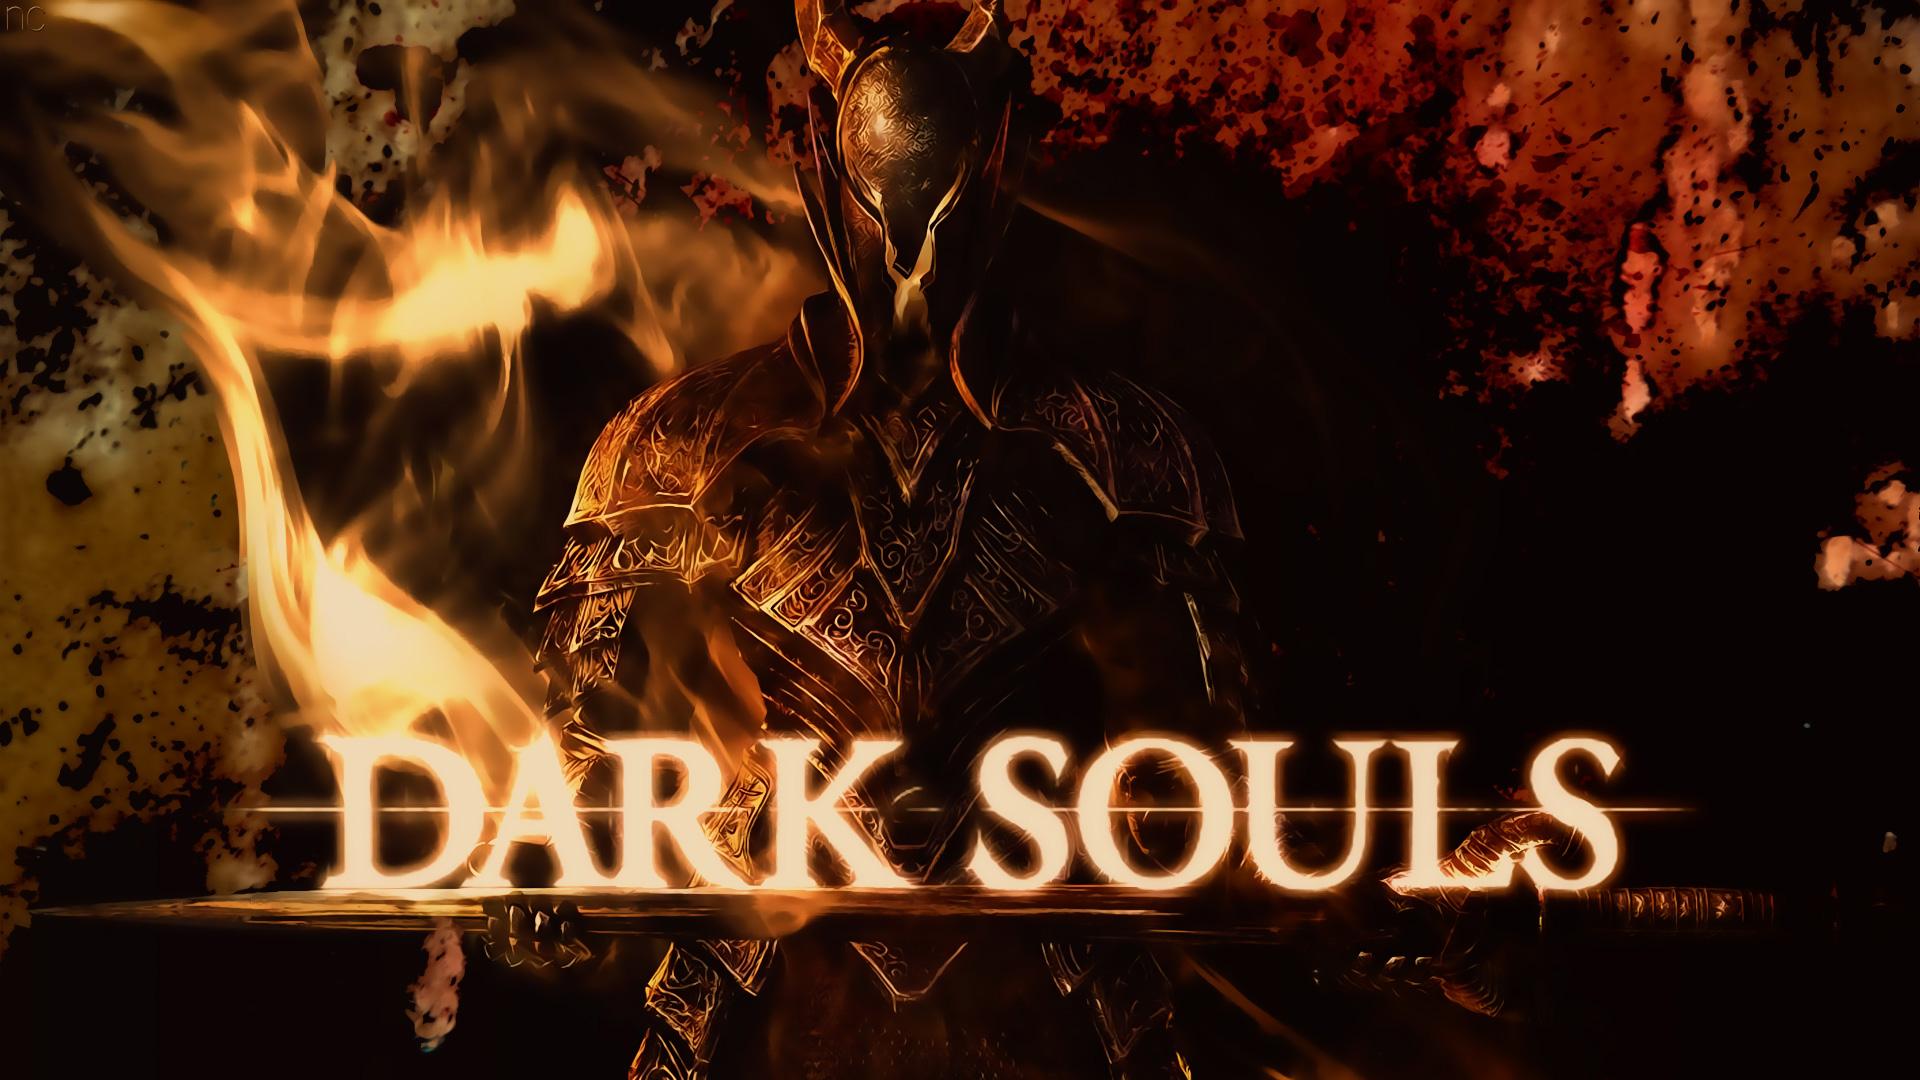 dark souls wallpapers